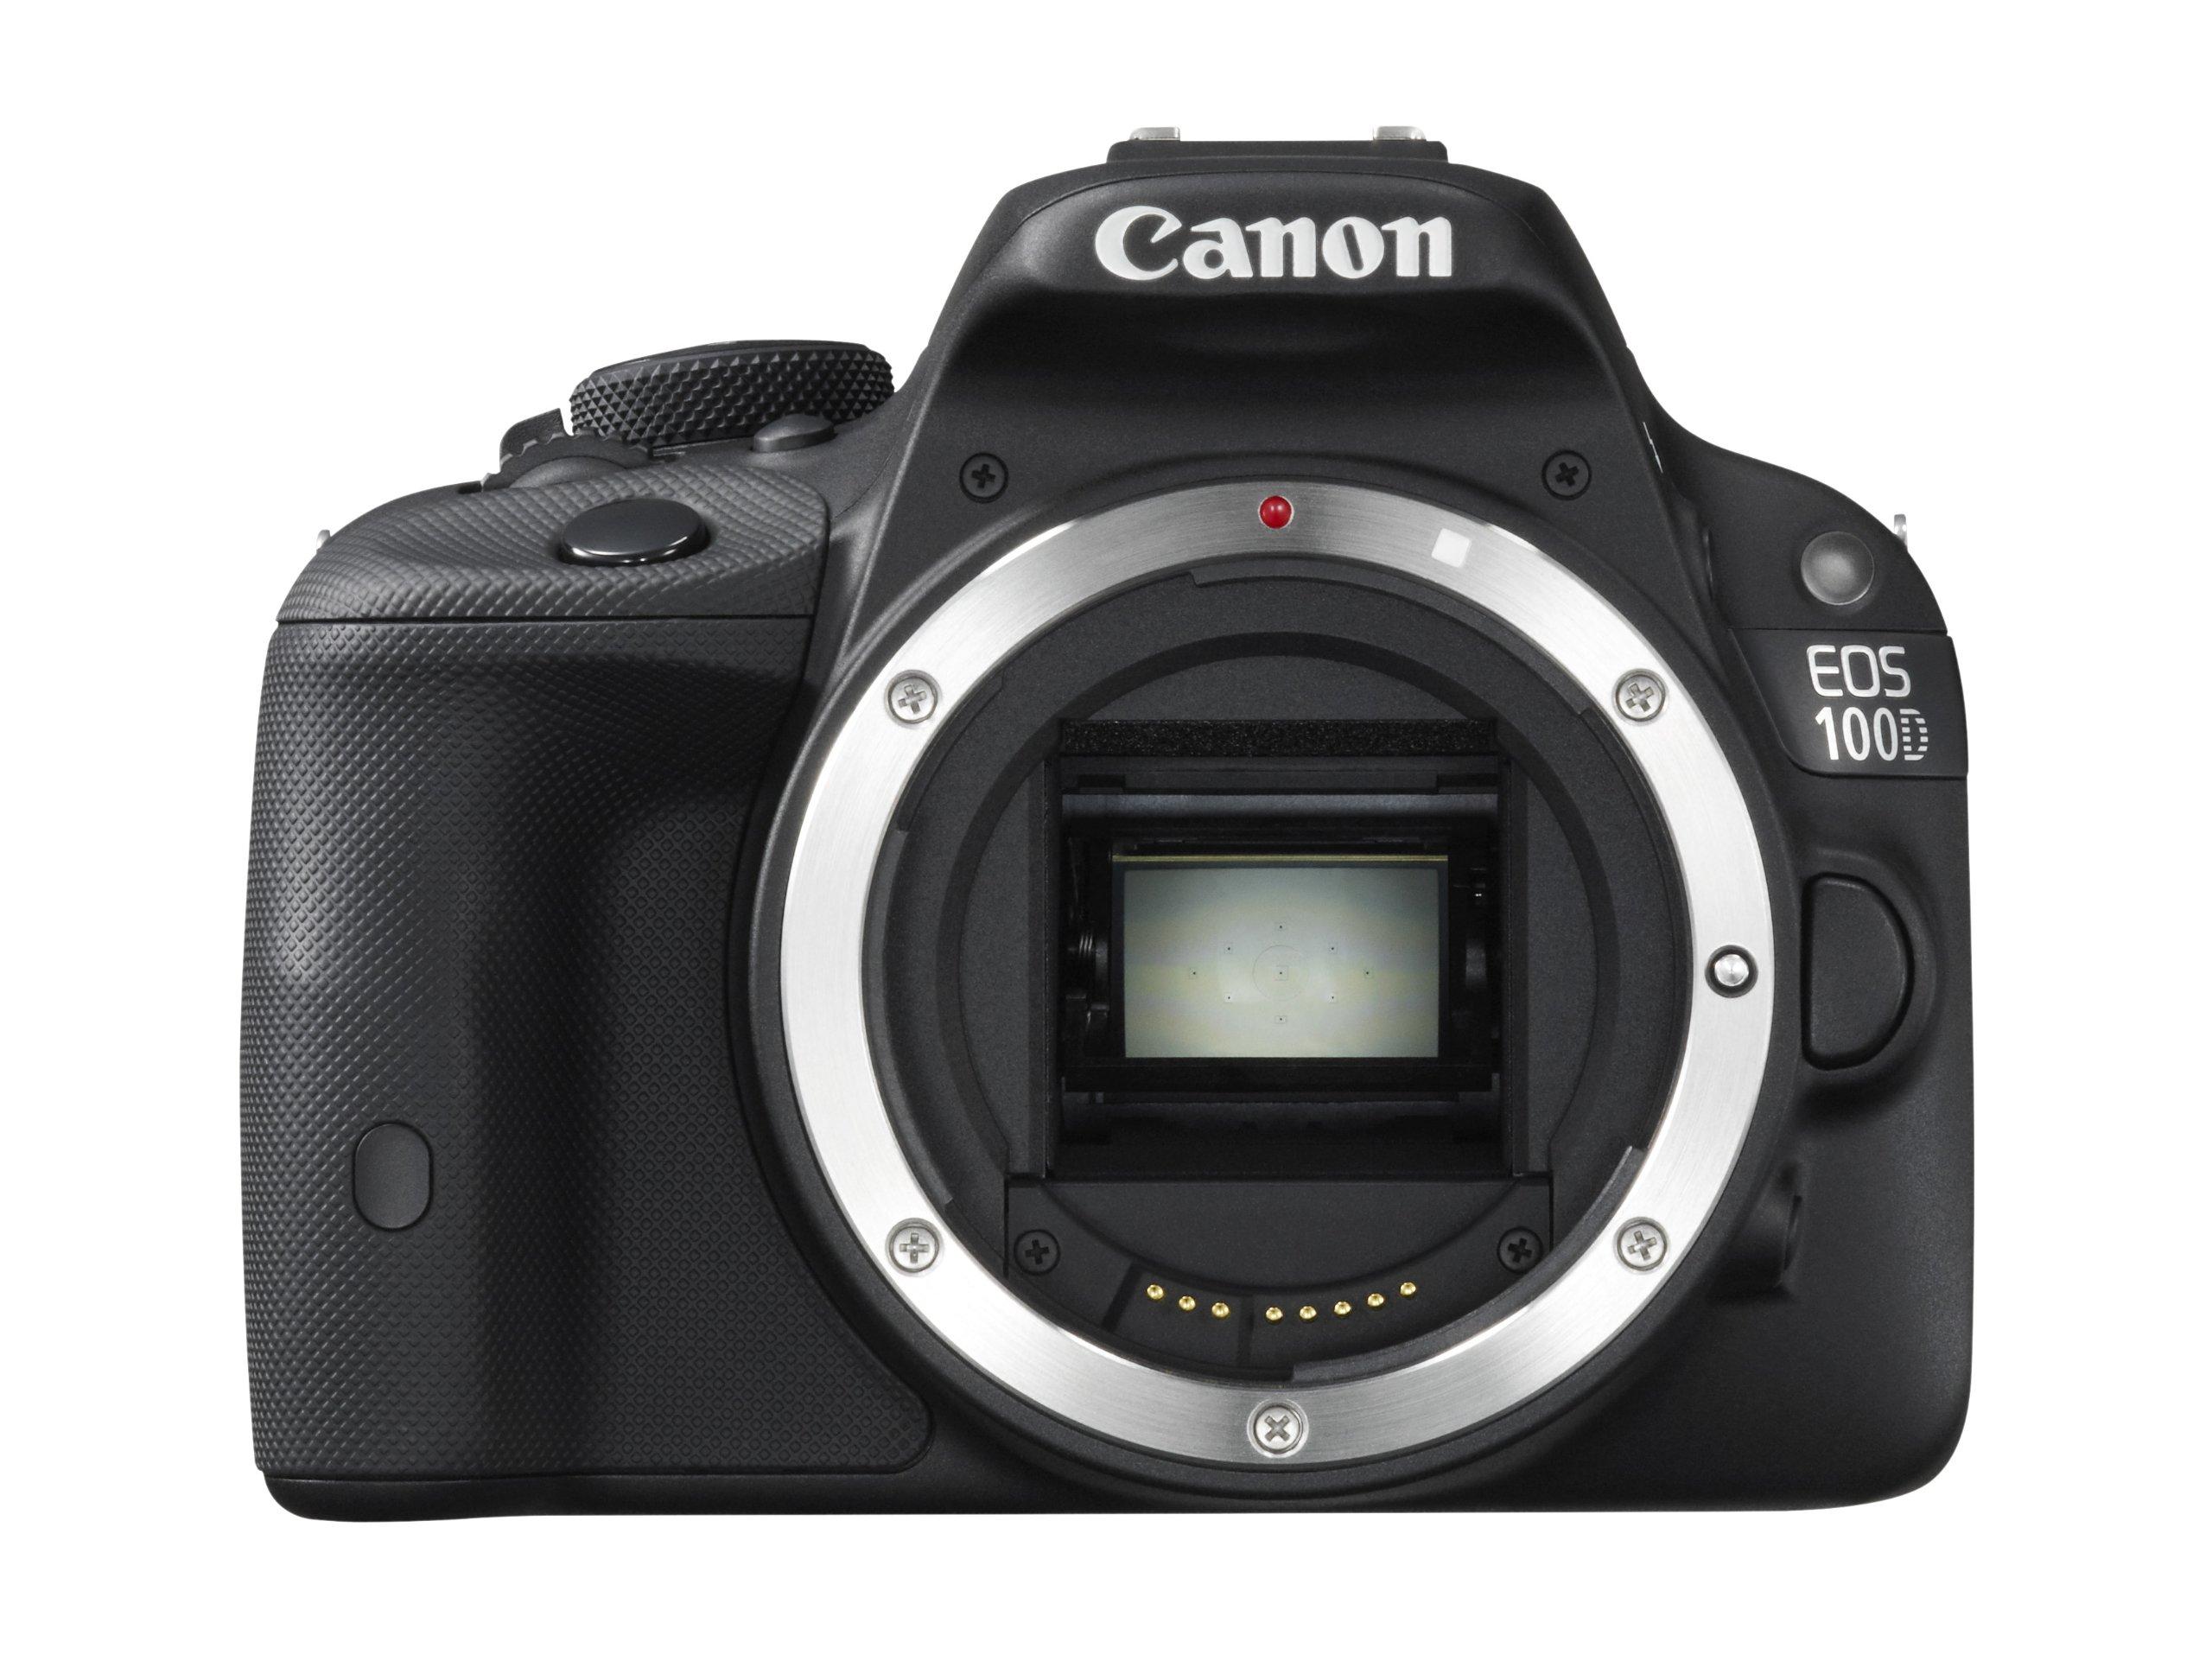 Canon EOS 100D Reflex Fotocamera Digitale, 18 Megapixel product image